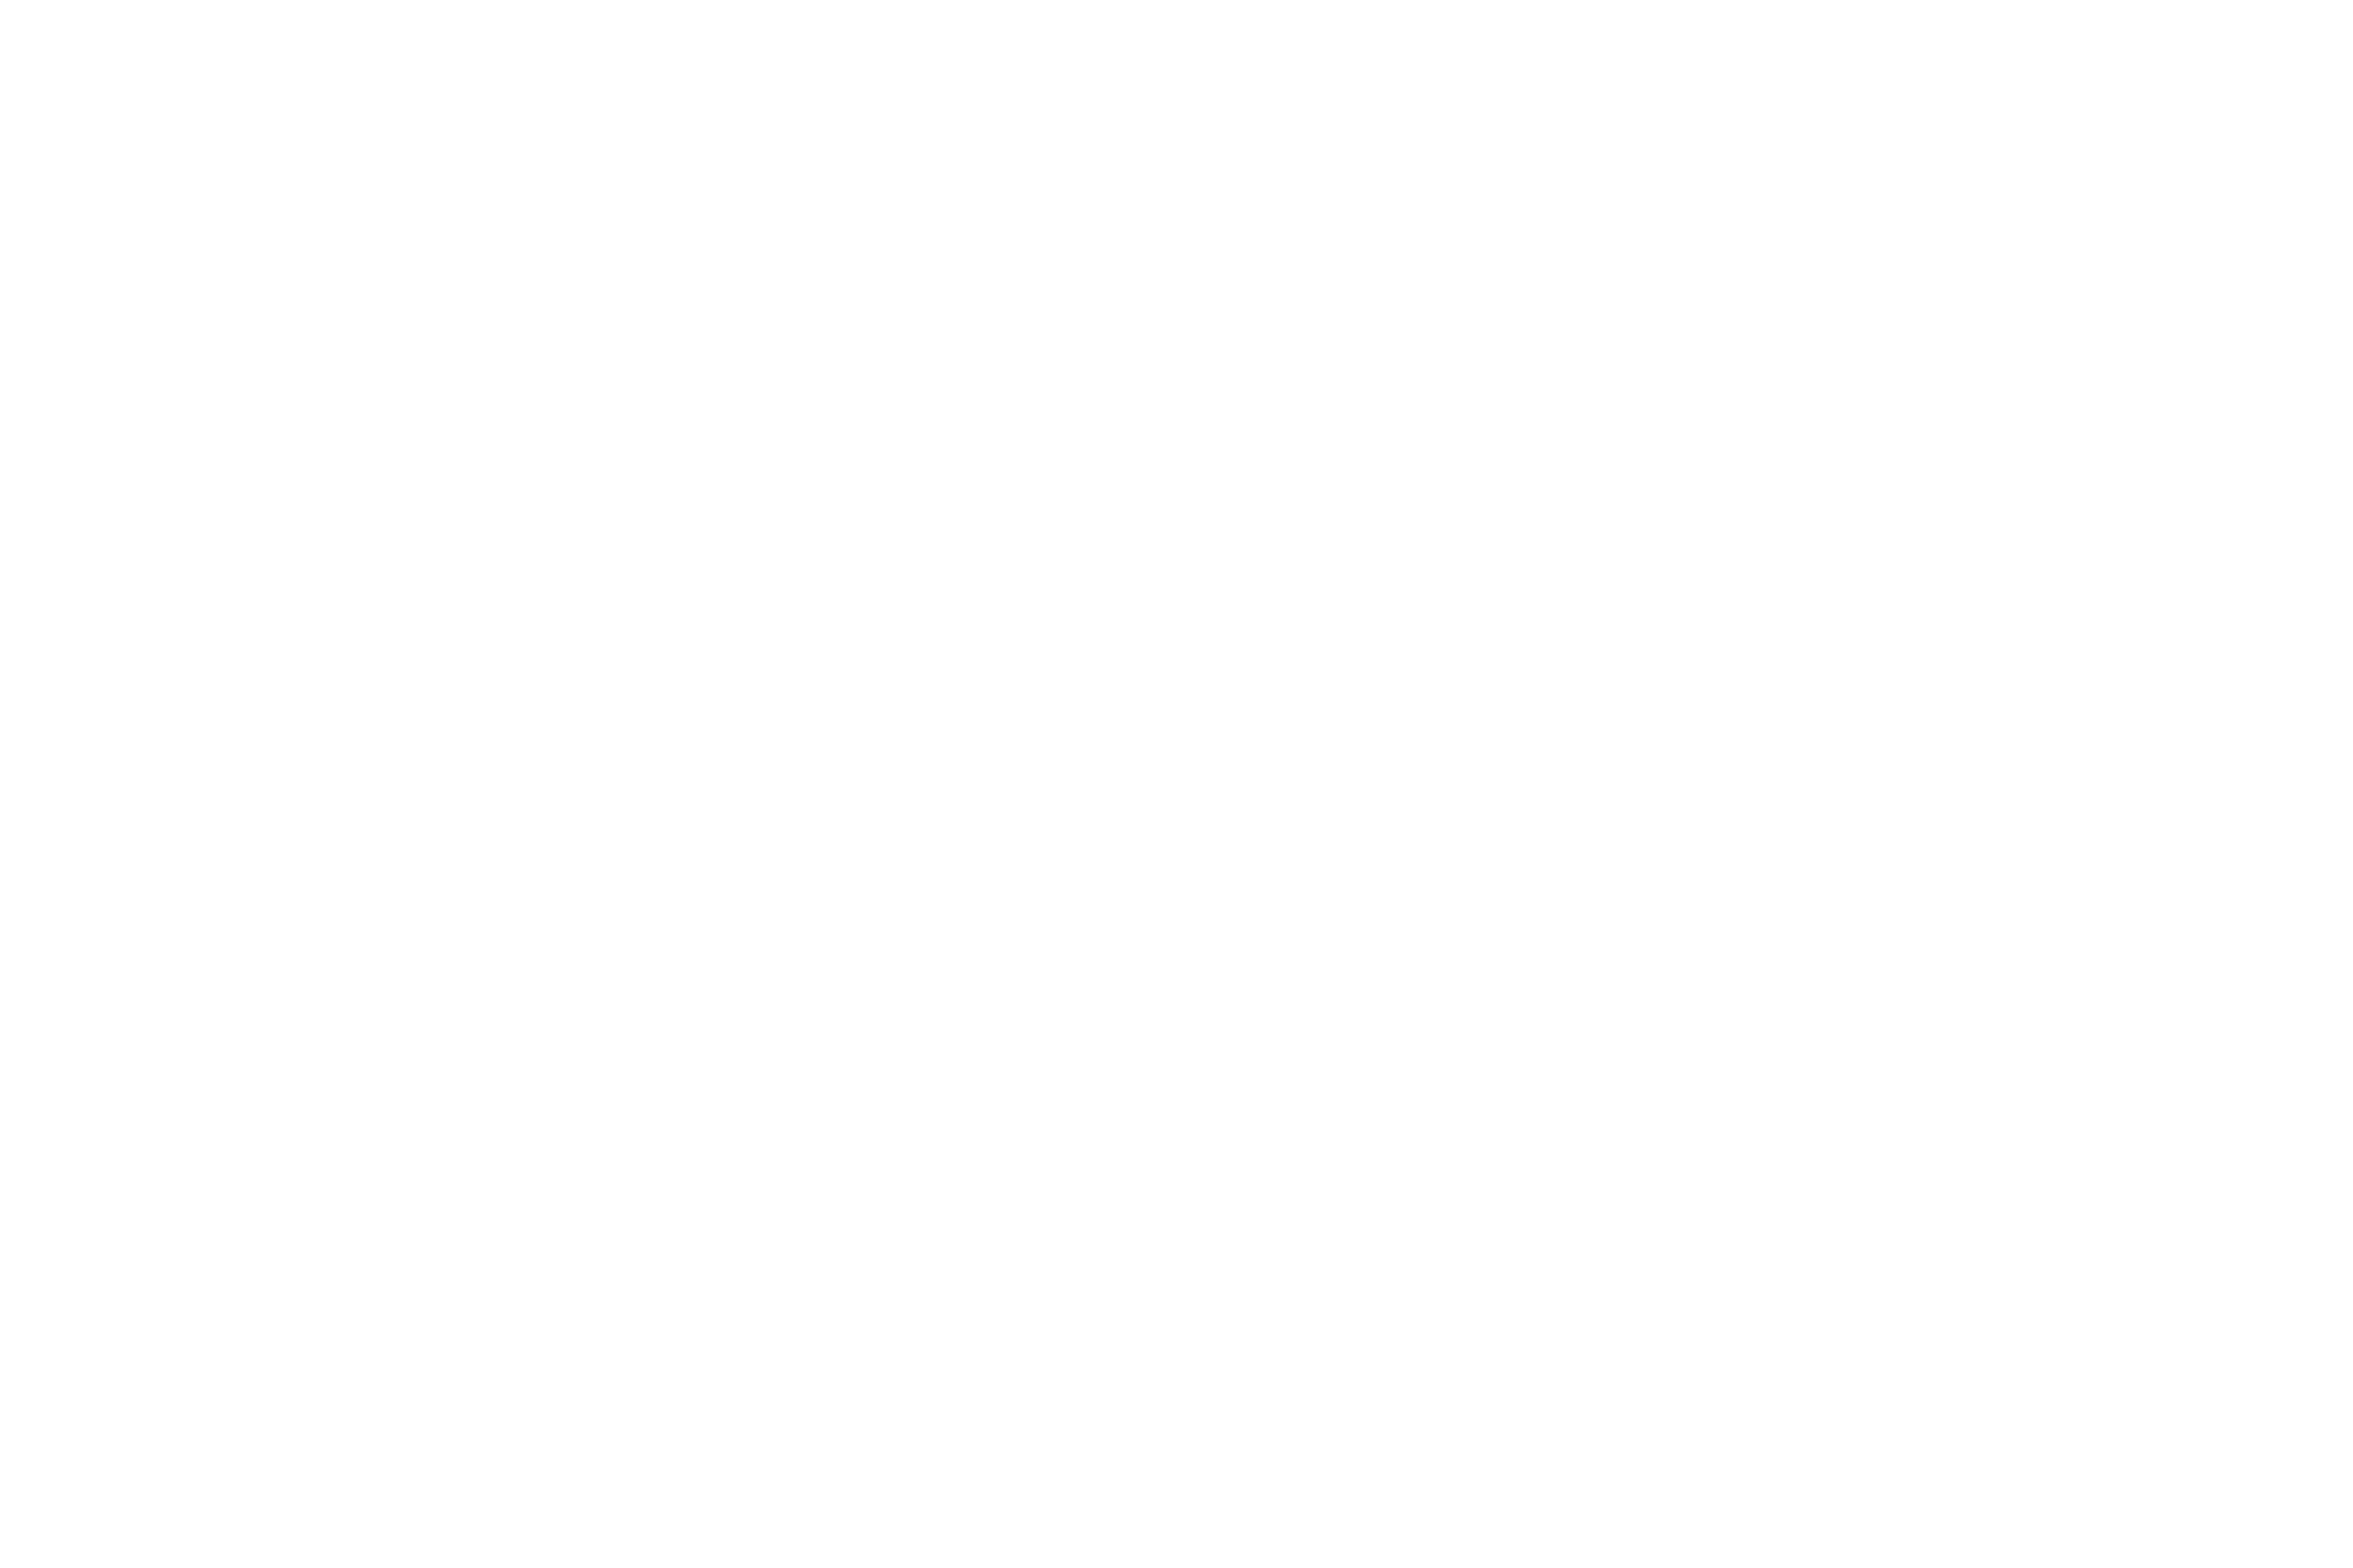 rj0111